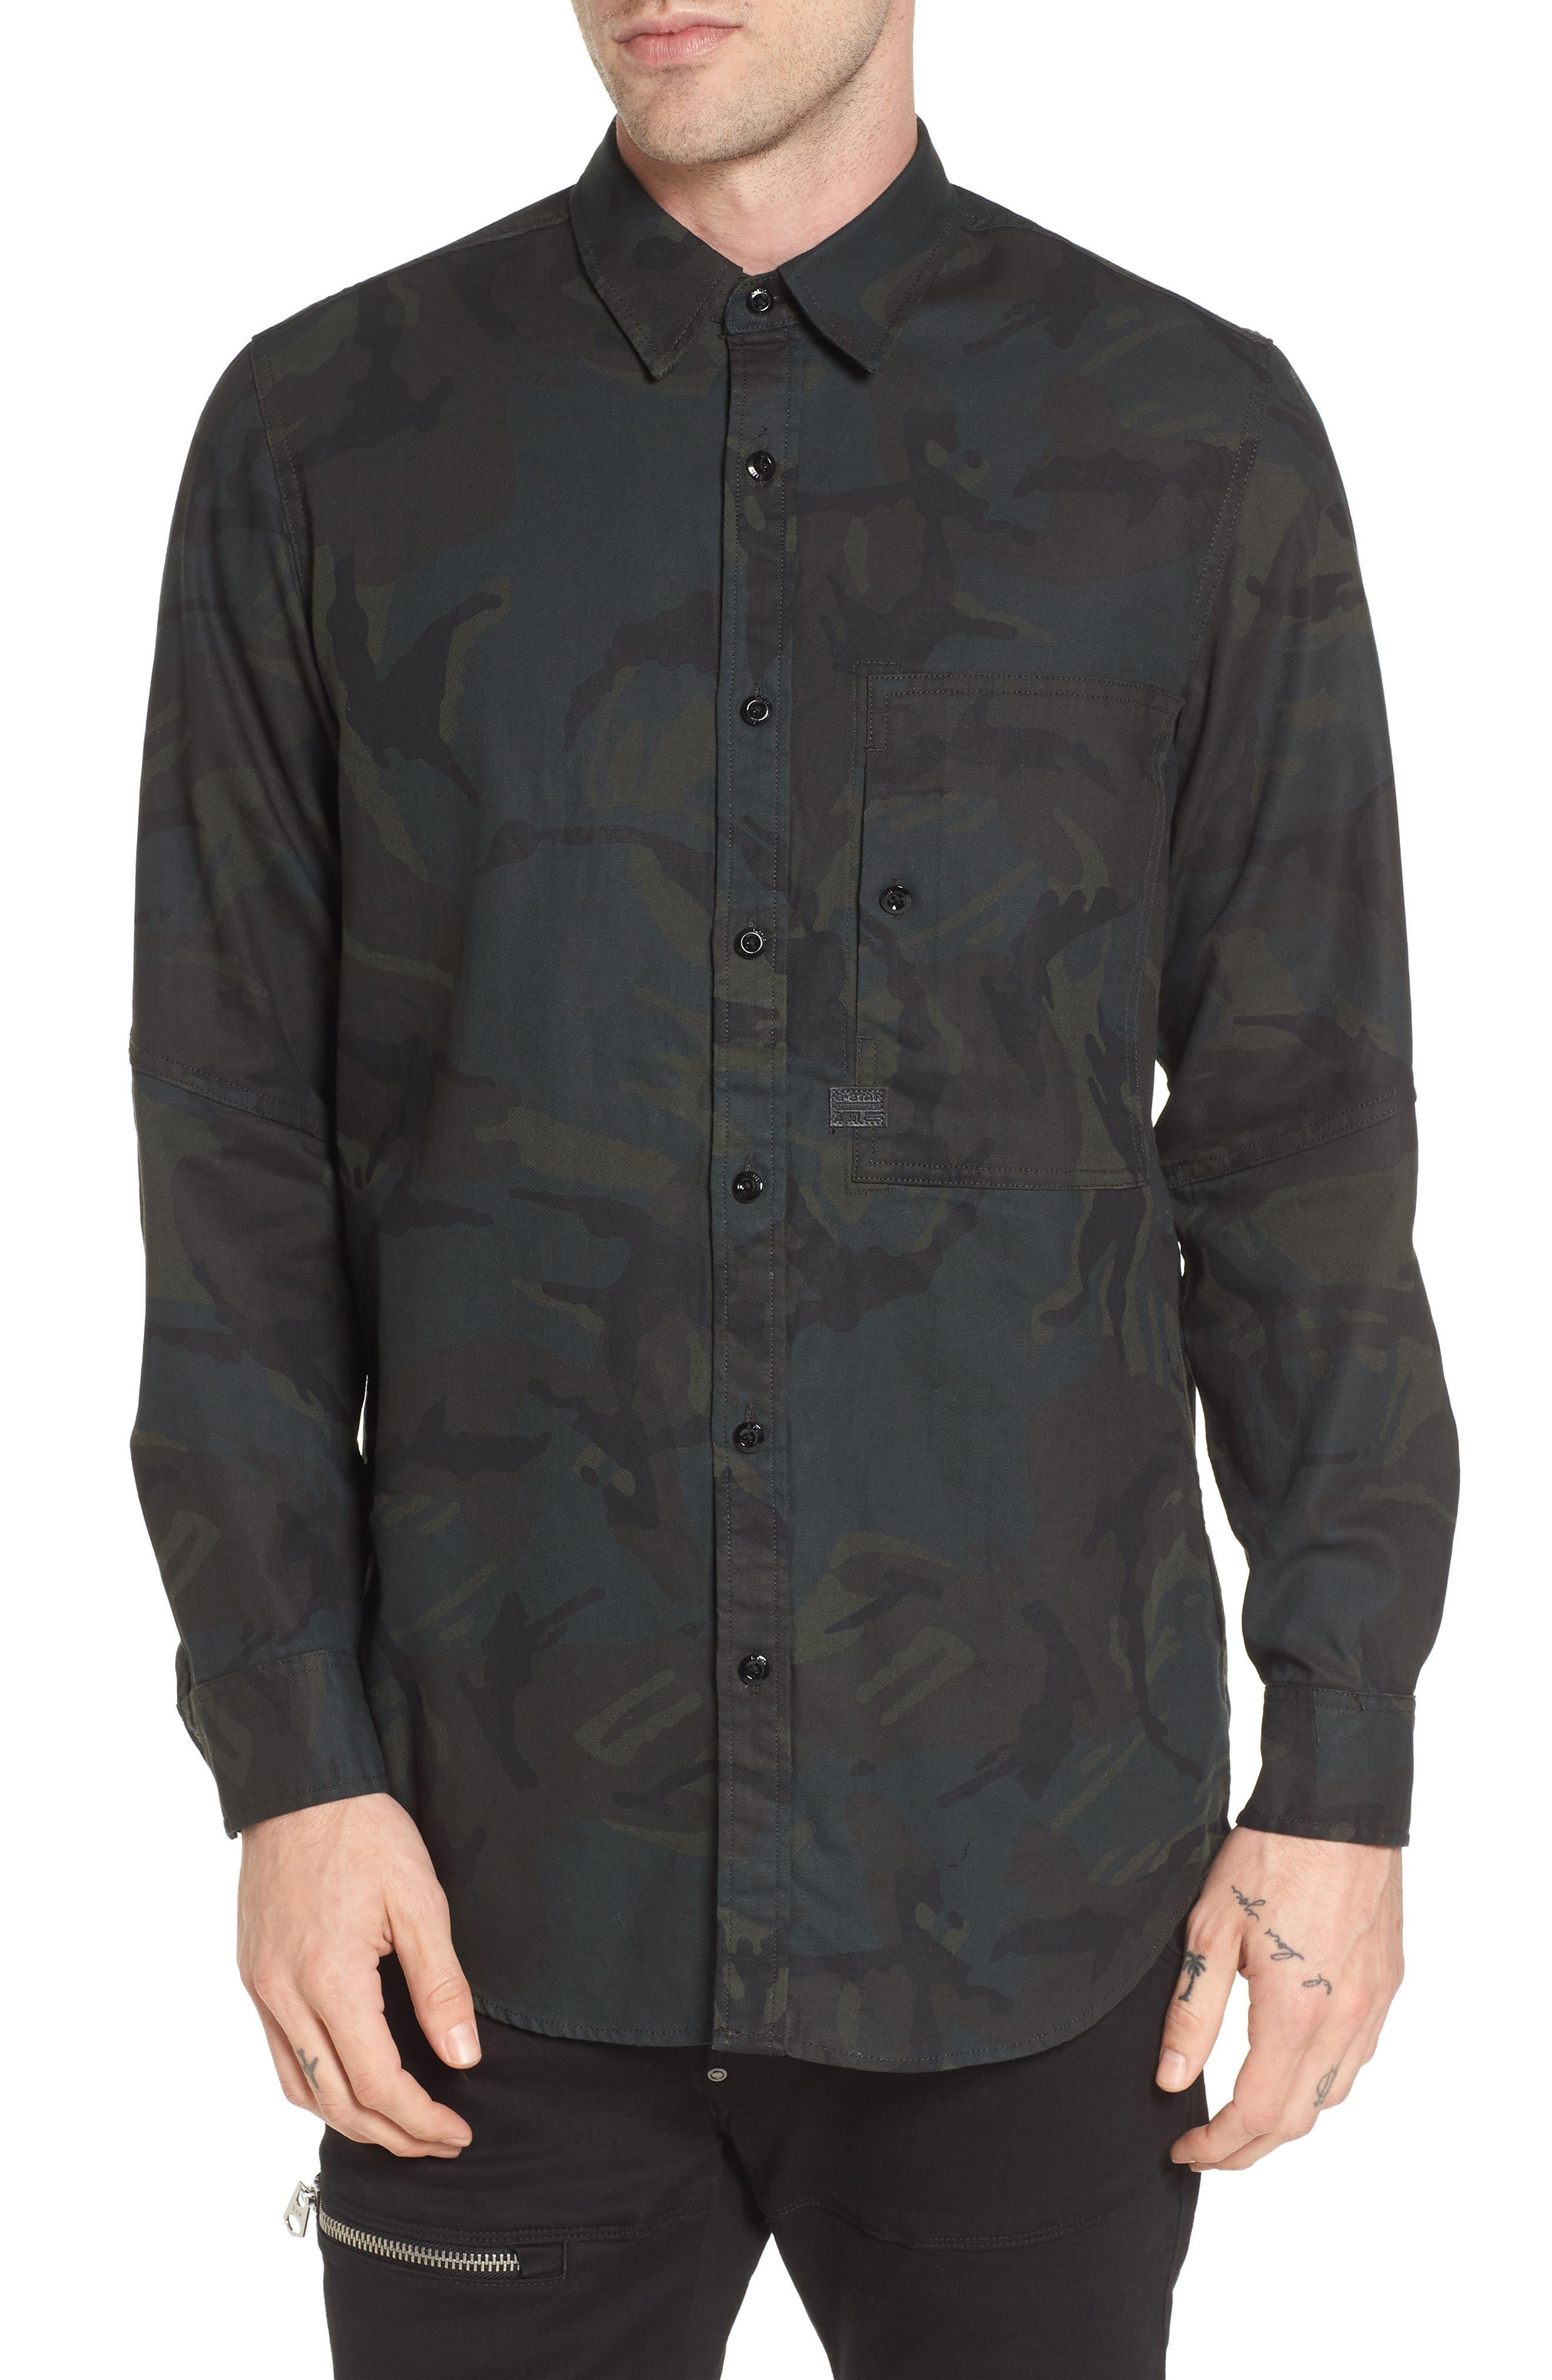 Stalt Long Sleeve Denim Shirt,                             Main thumbnail 1, color,                             Asphalt/ Black